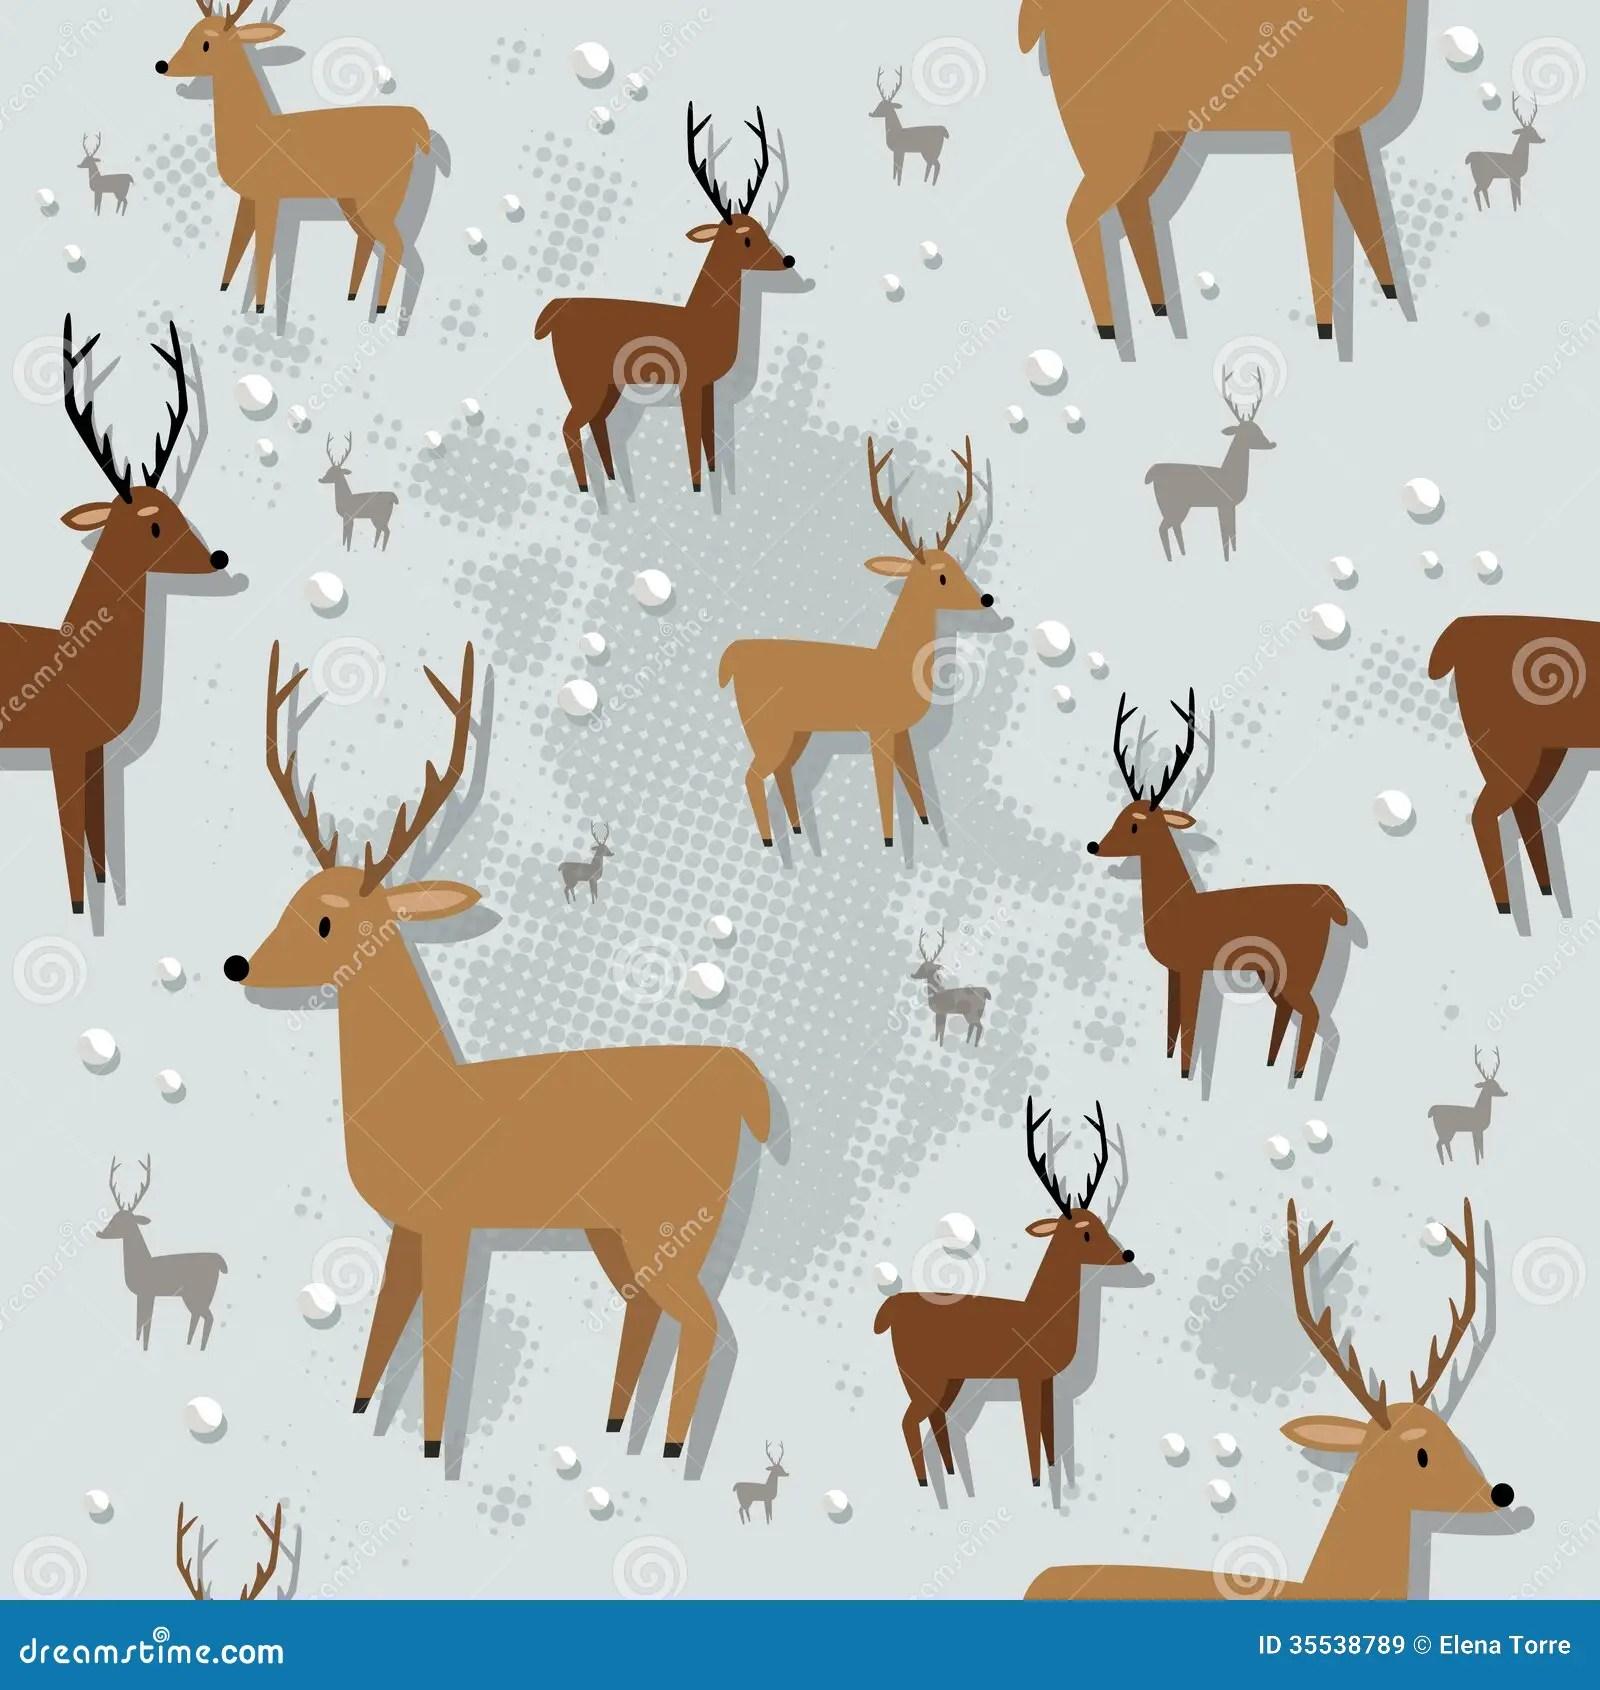 Christmas Reindeer Seamless Pattern Stock Vector